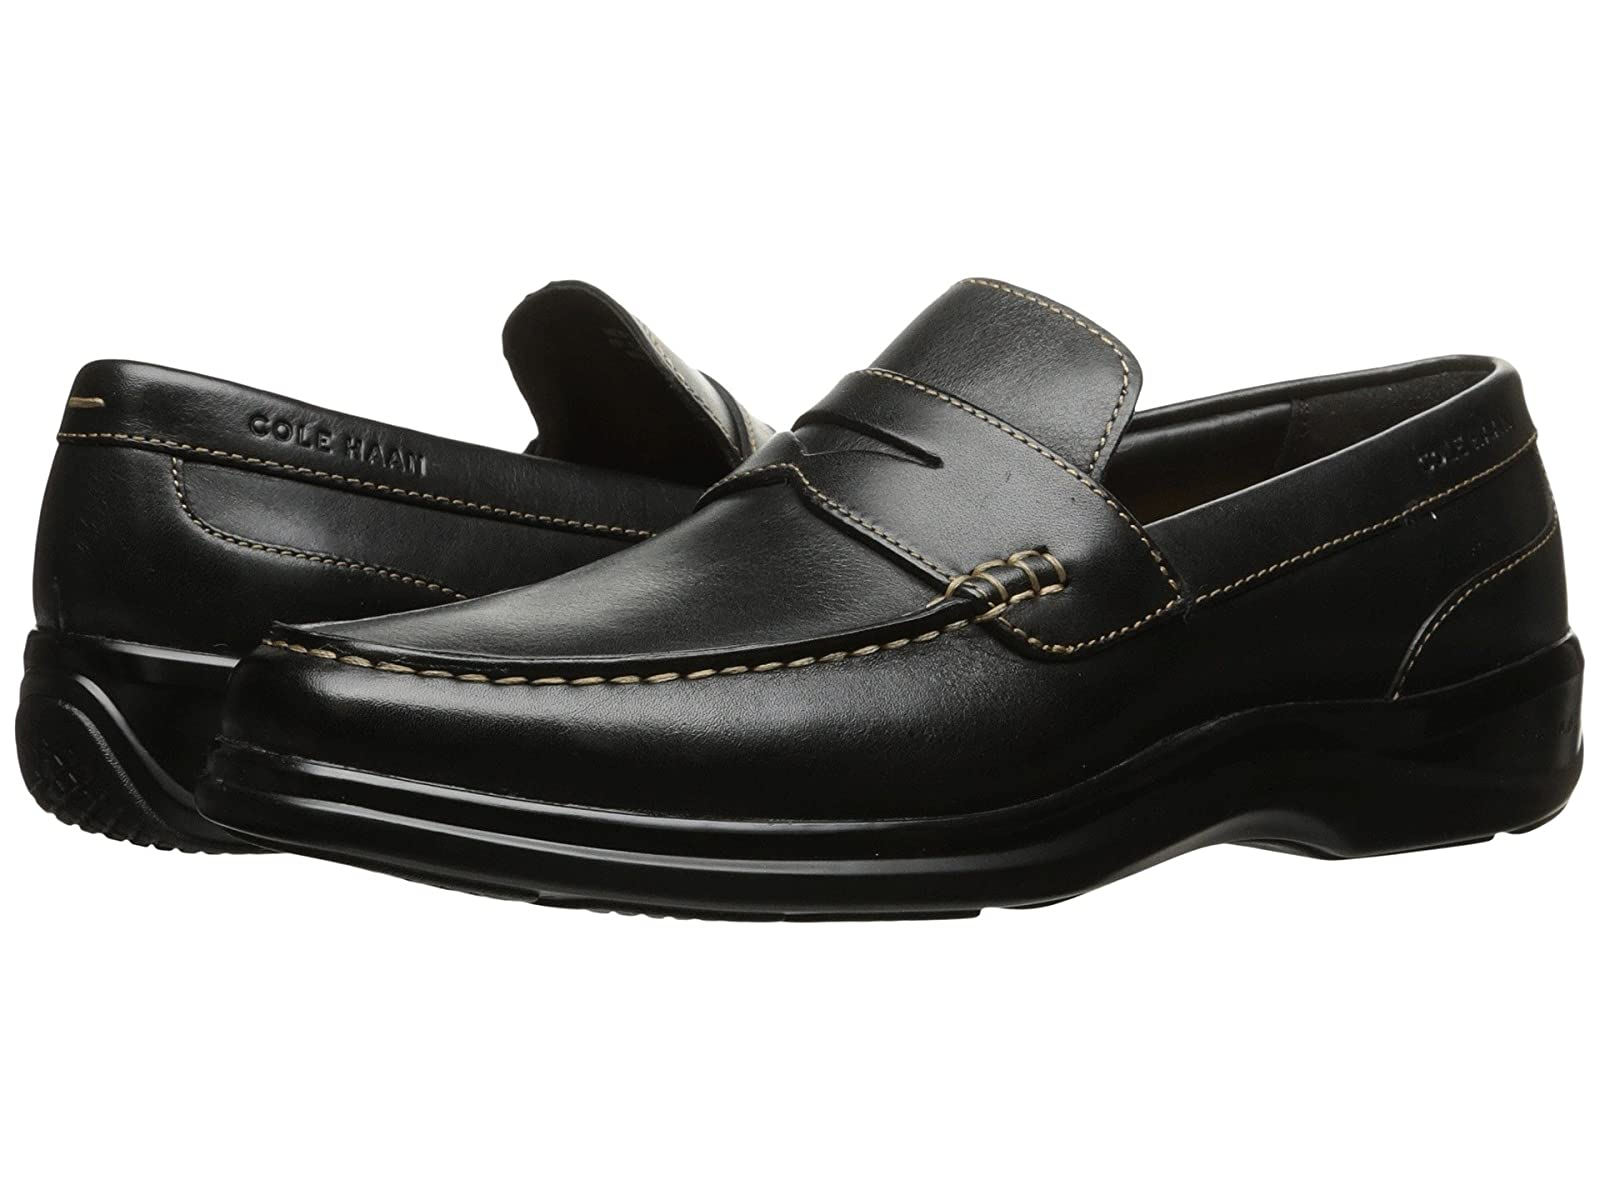 Cole Haan Santa Barbara Penny IIAtmospheric grades have affordable shoes